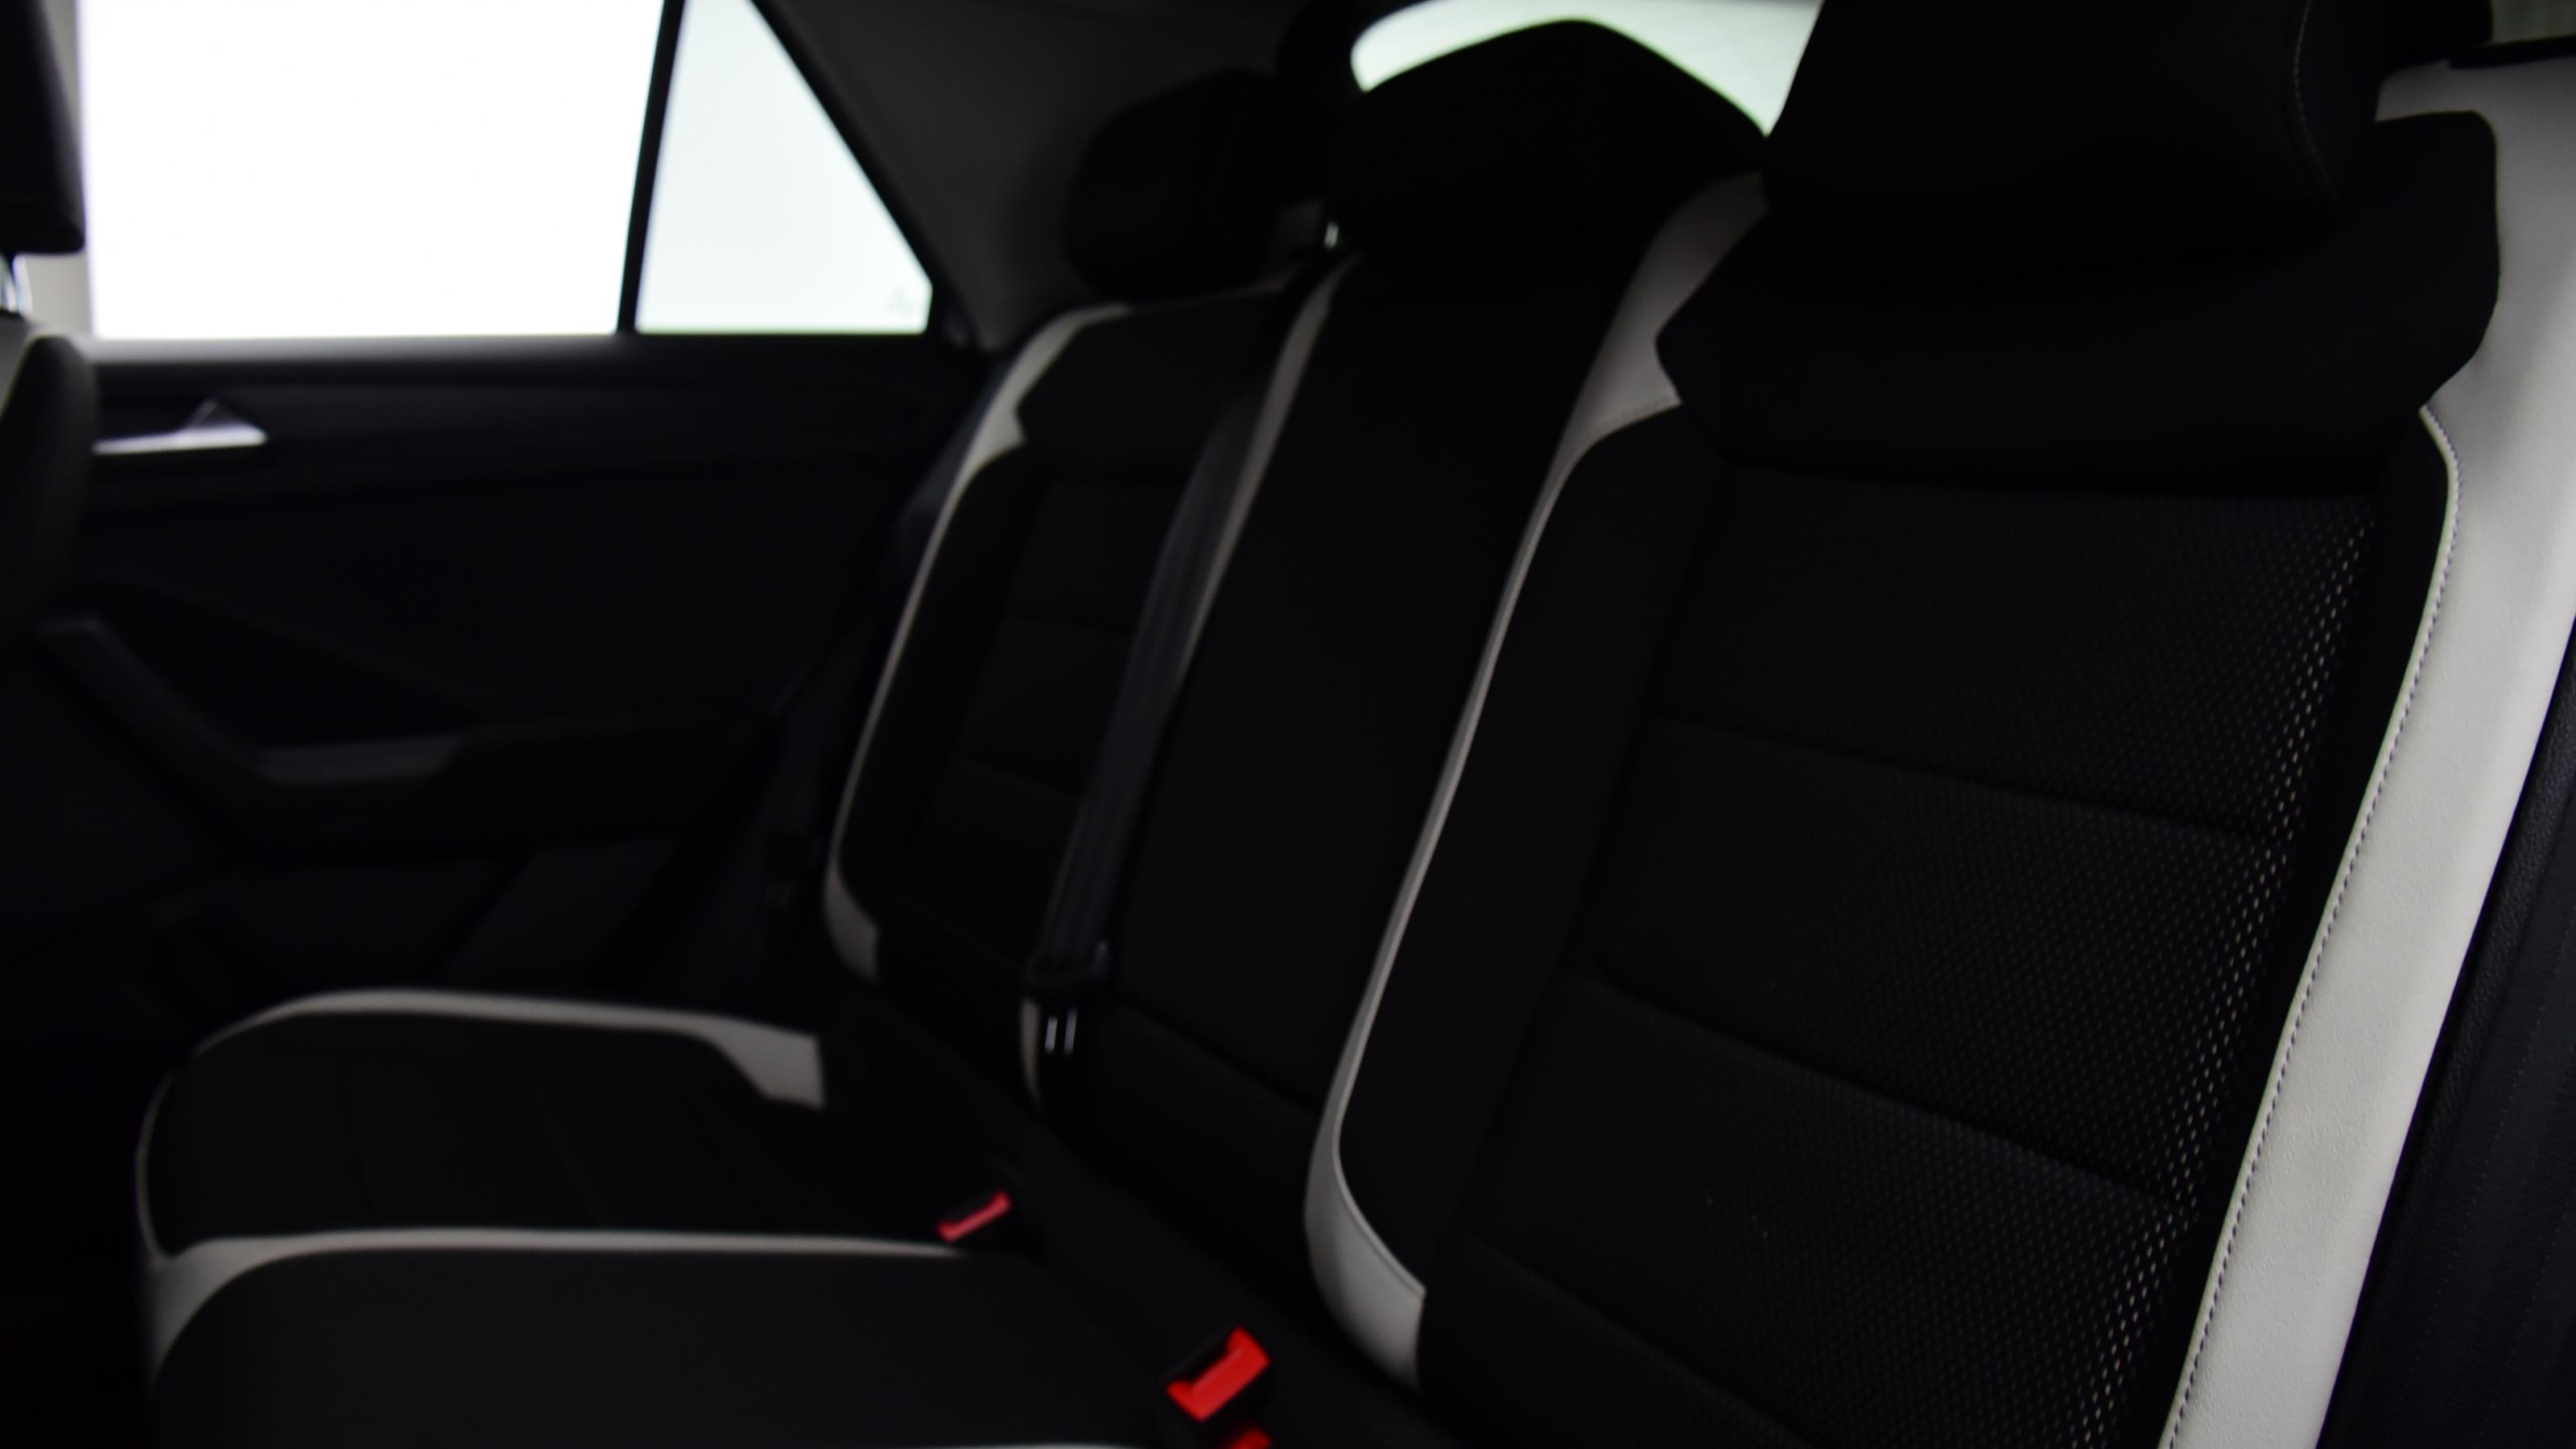 Used 2018 Volkswagen T-ROC 1.5 TSI EVO SEL 5dr SILVER at Saxton4x4